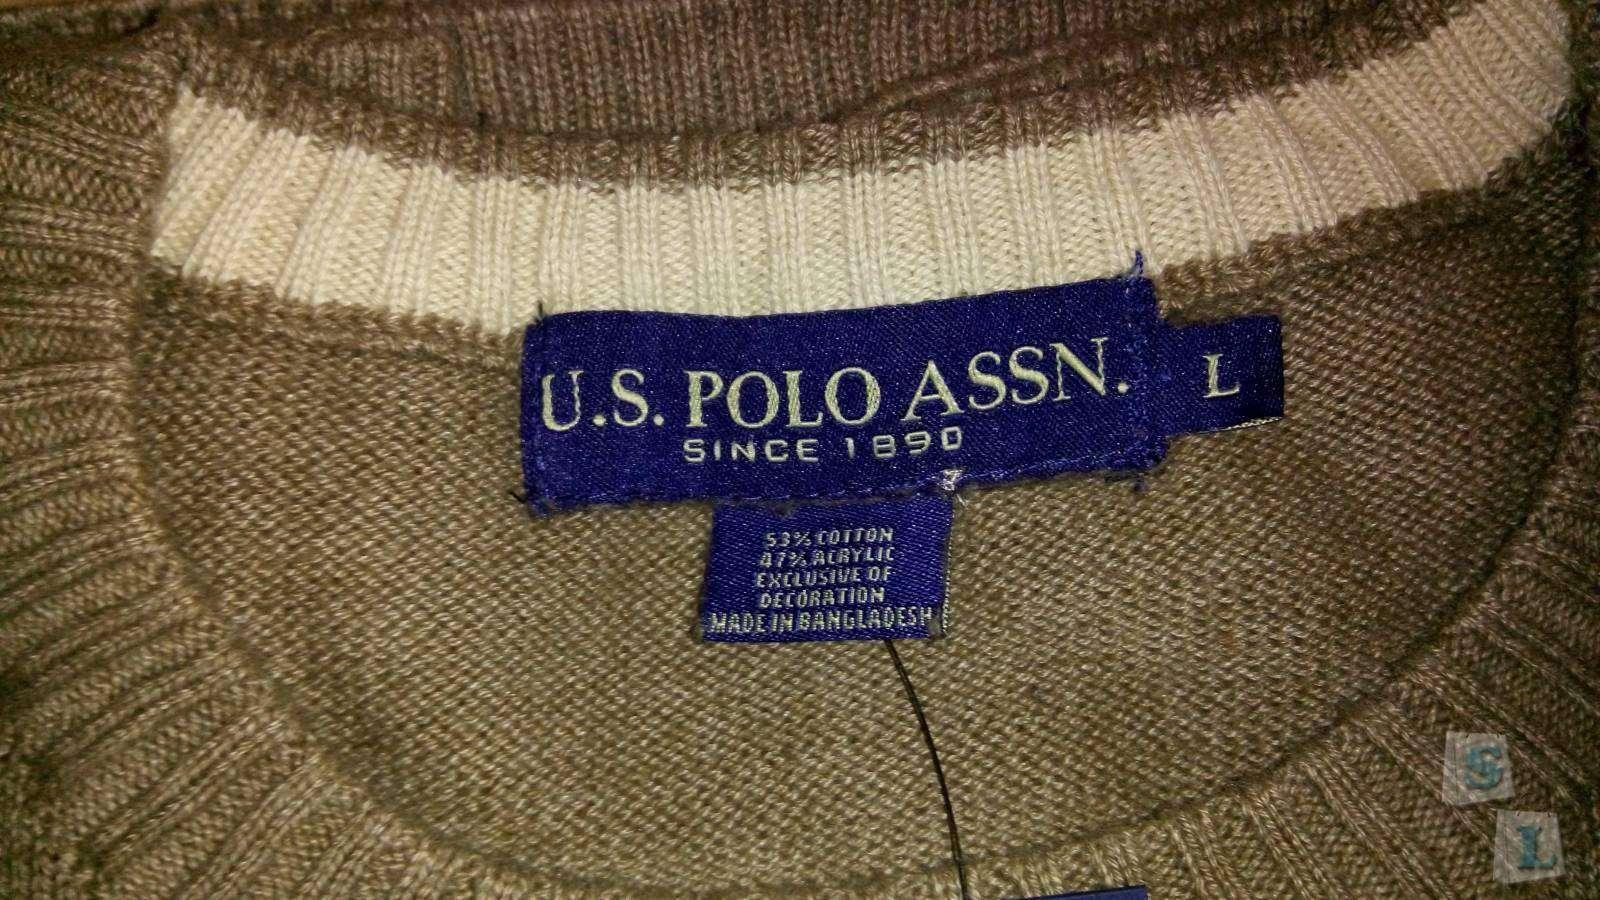 6pm: Свитер U.S. POLO ASSN